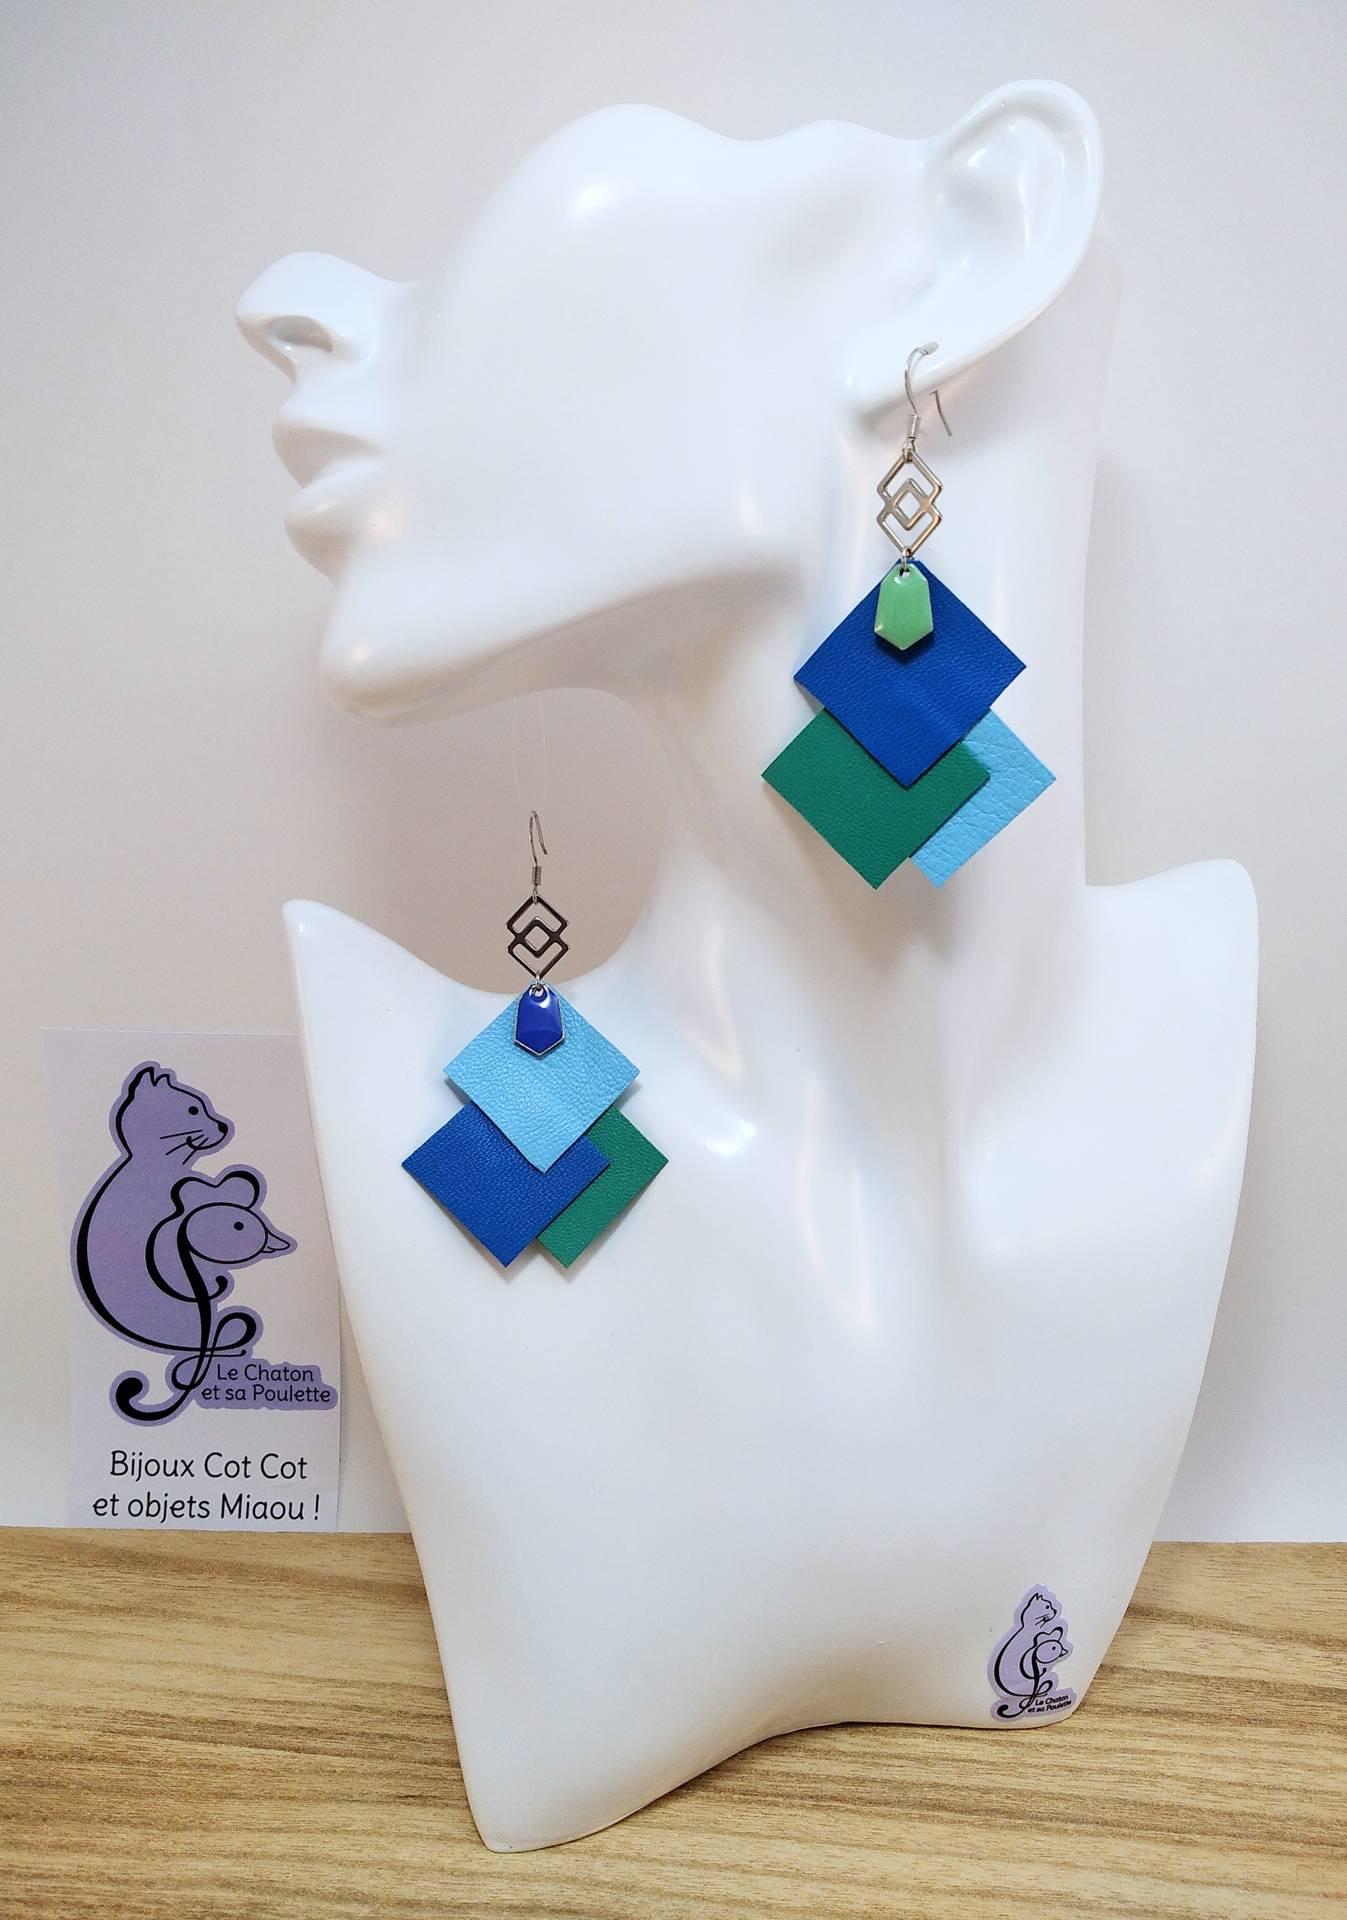 B.O. FORMIDABLE modèle 6 Cuirs bleu cobalt/vert prasin/bleu azur, breloque inox carrés entrelacés et diamant vert d'eau ou bleu cobalt